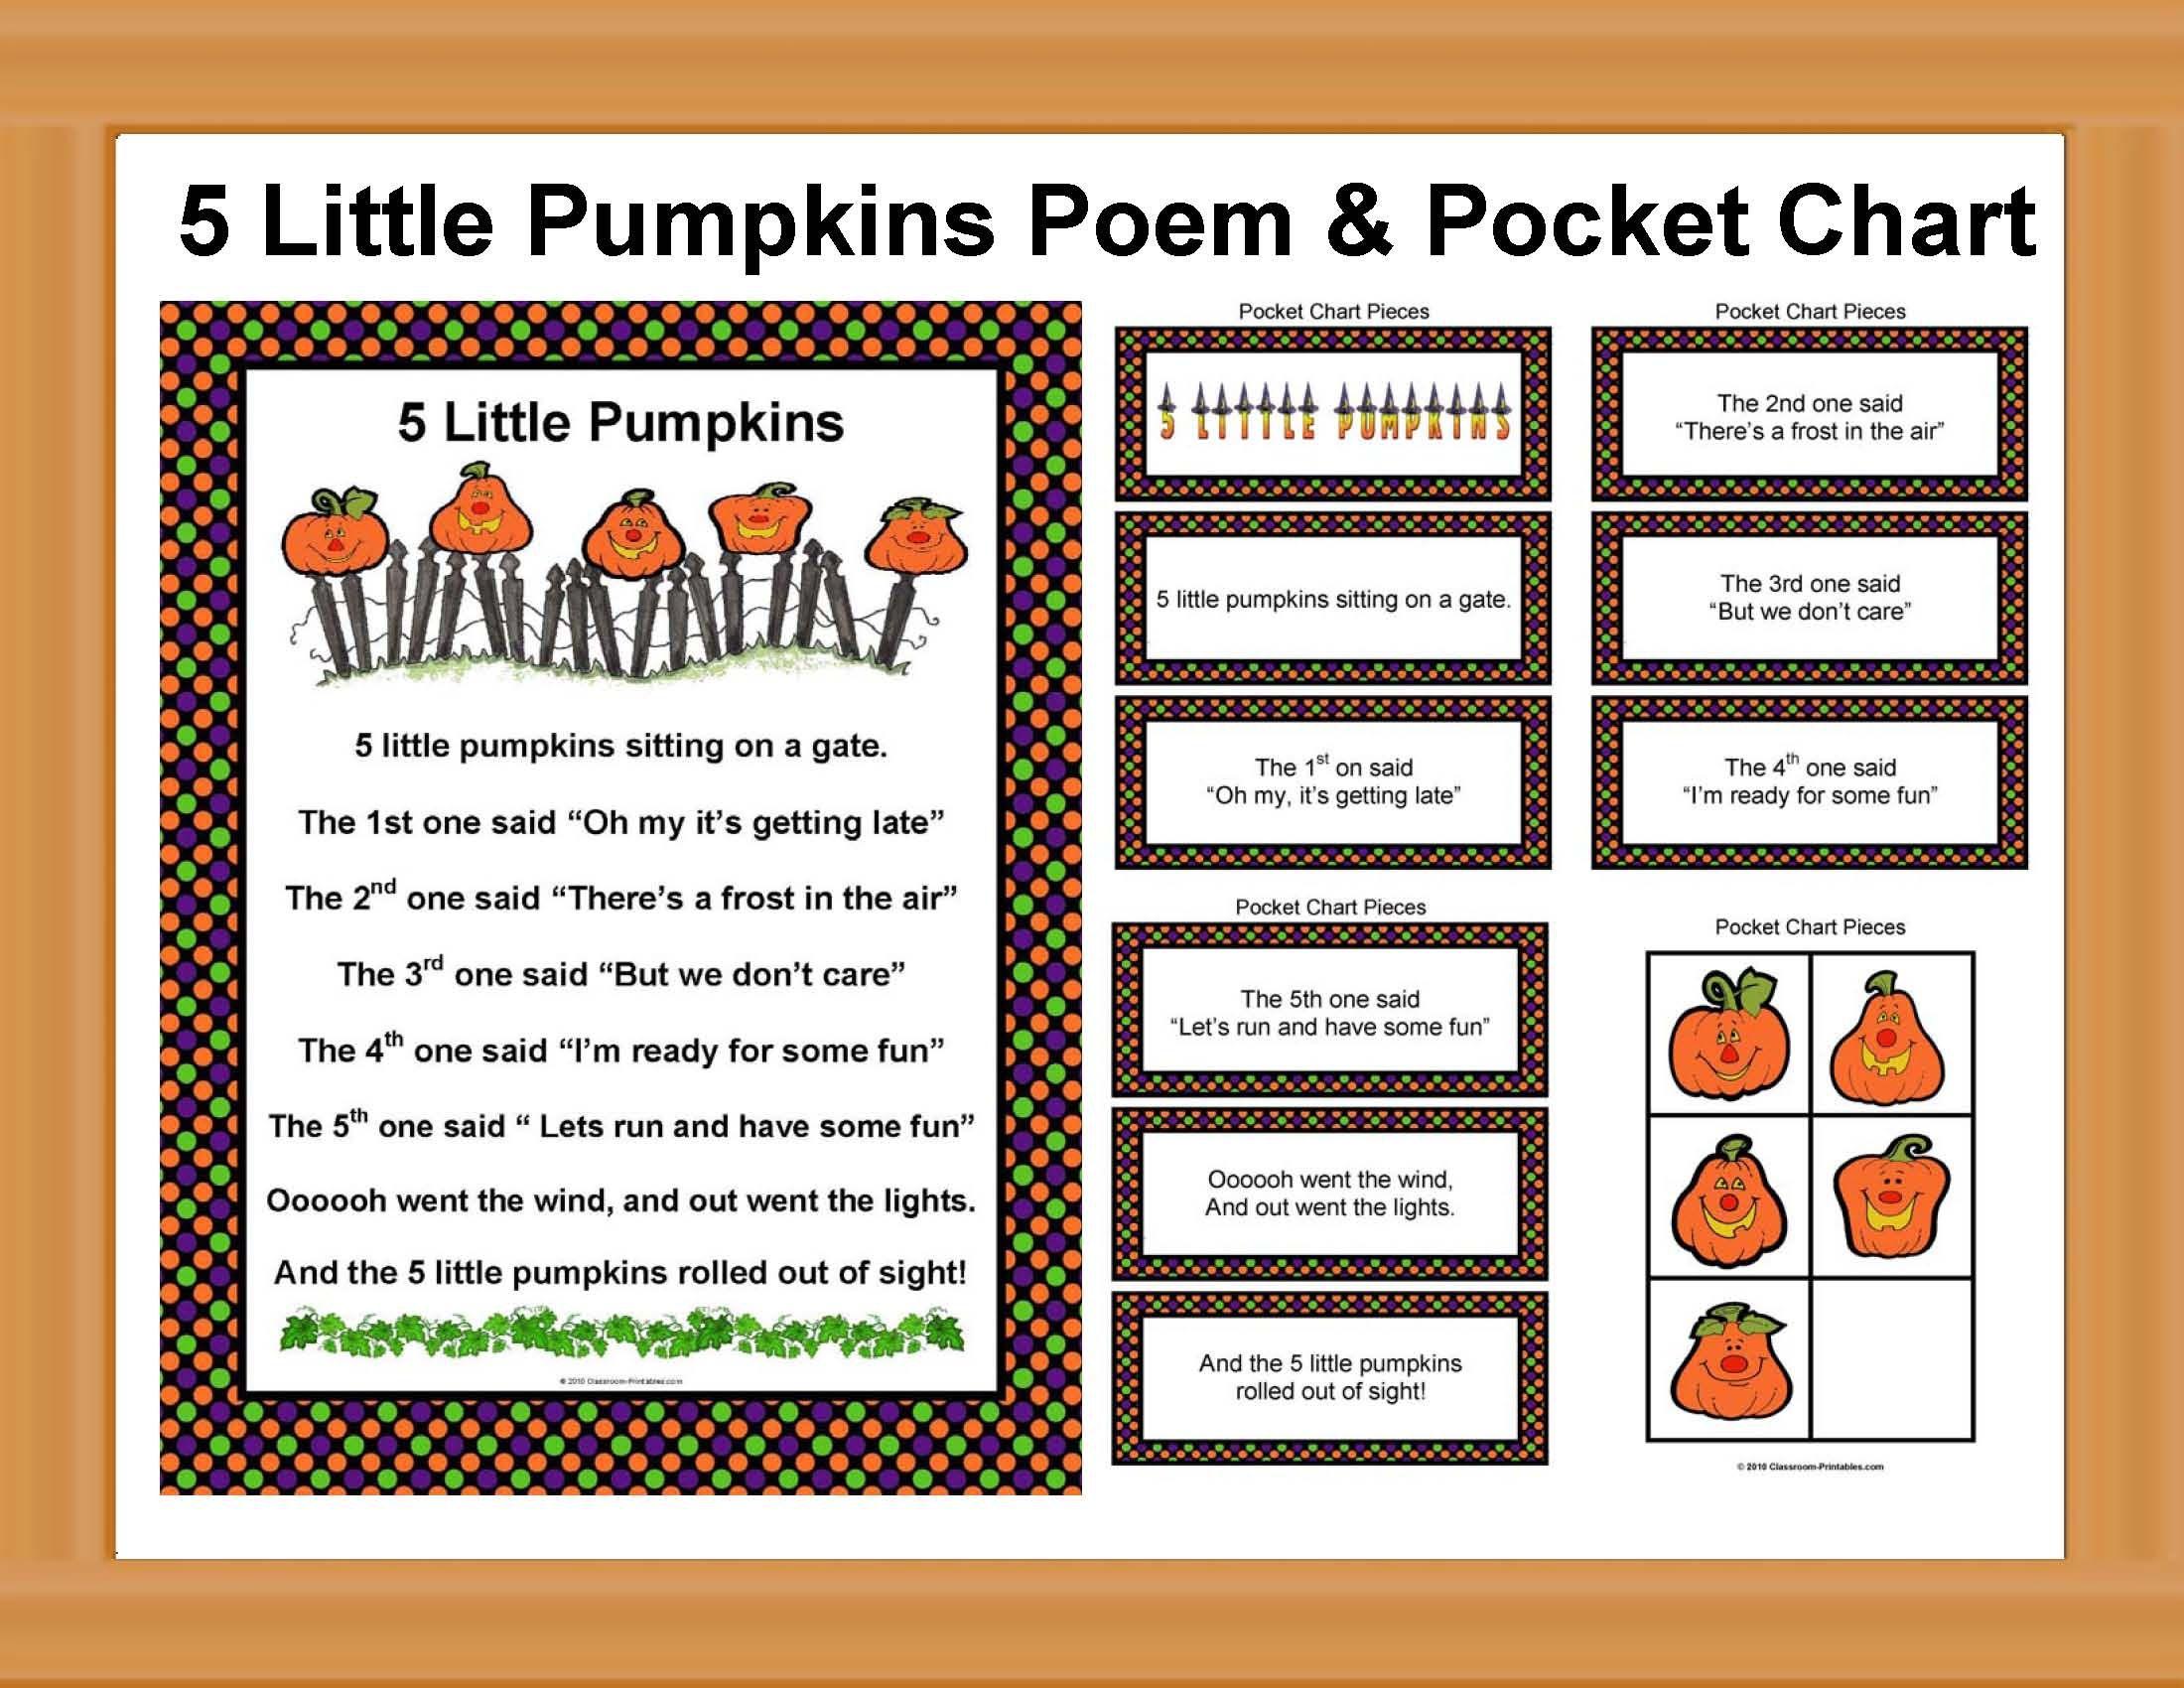 5 Little Pumpkins Poem With Pocket Chart Pieces